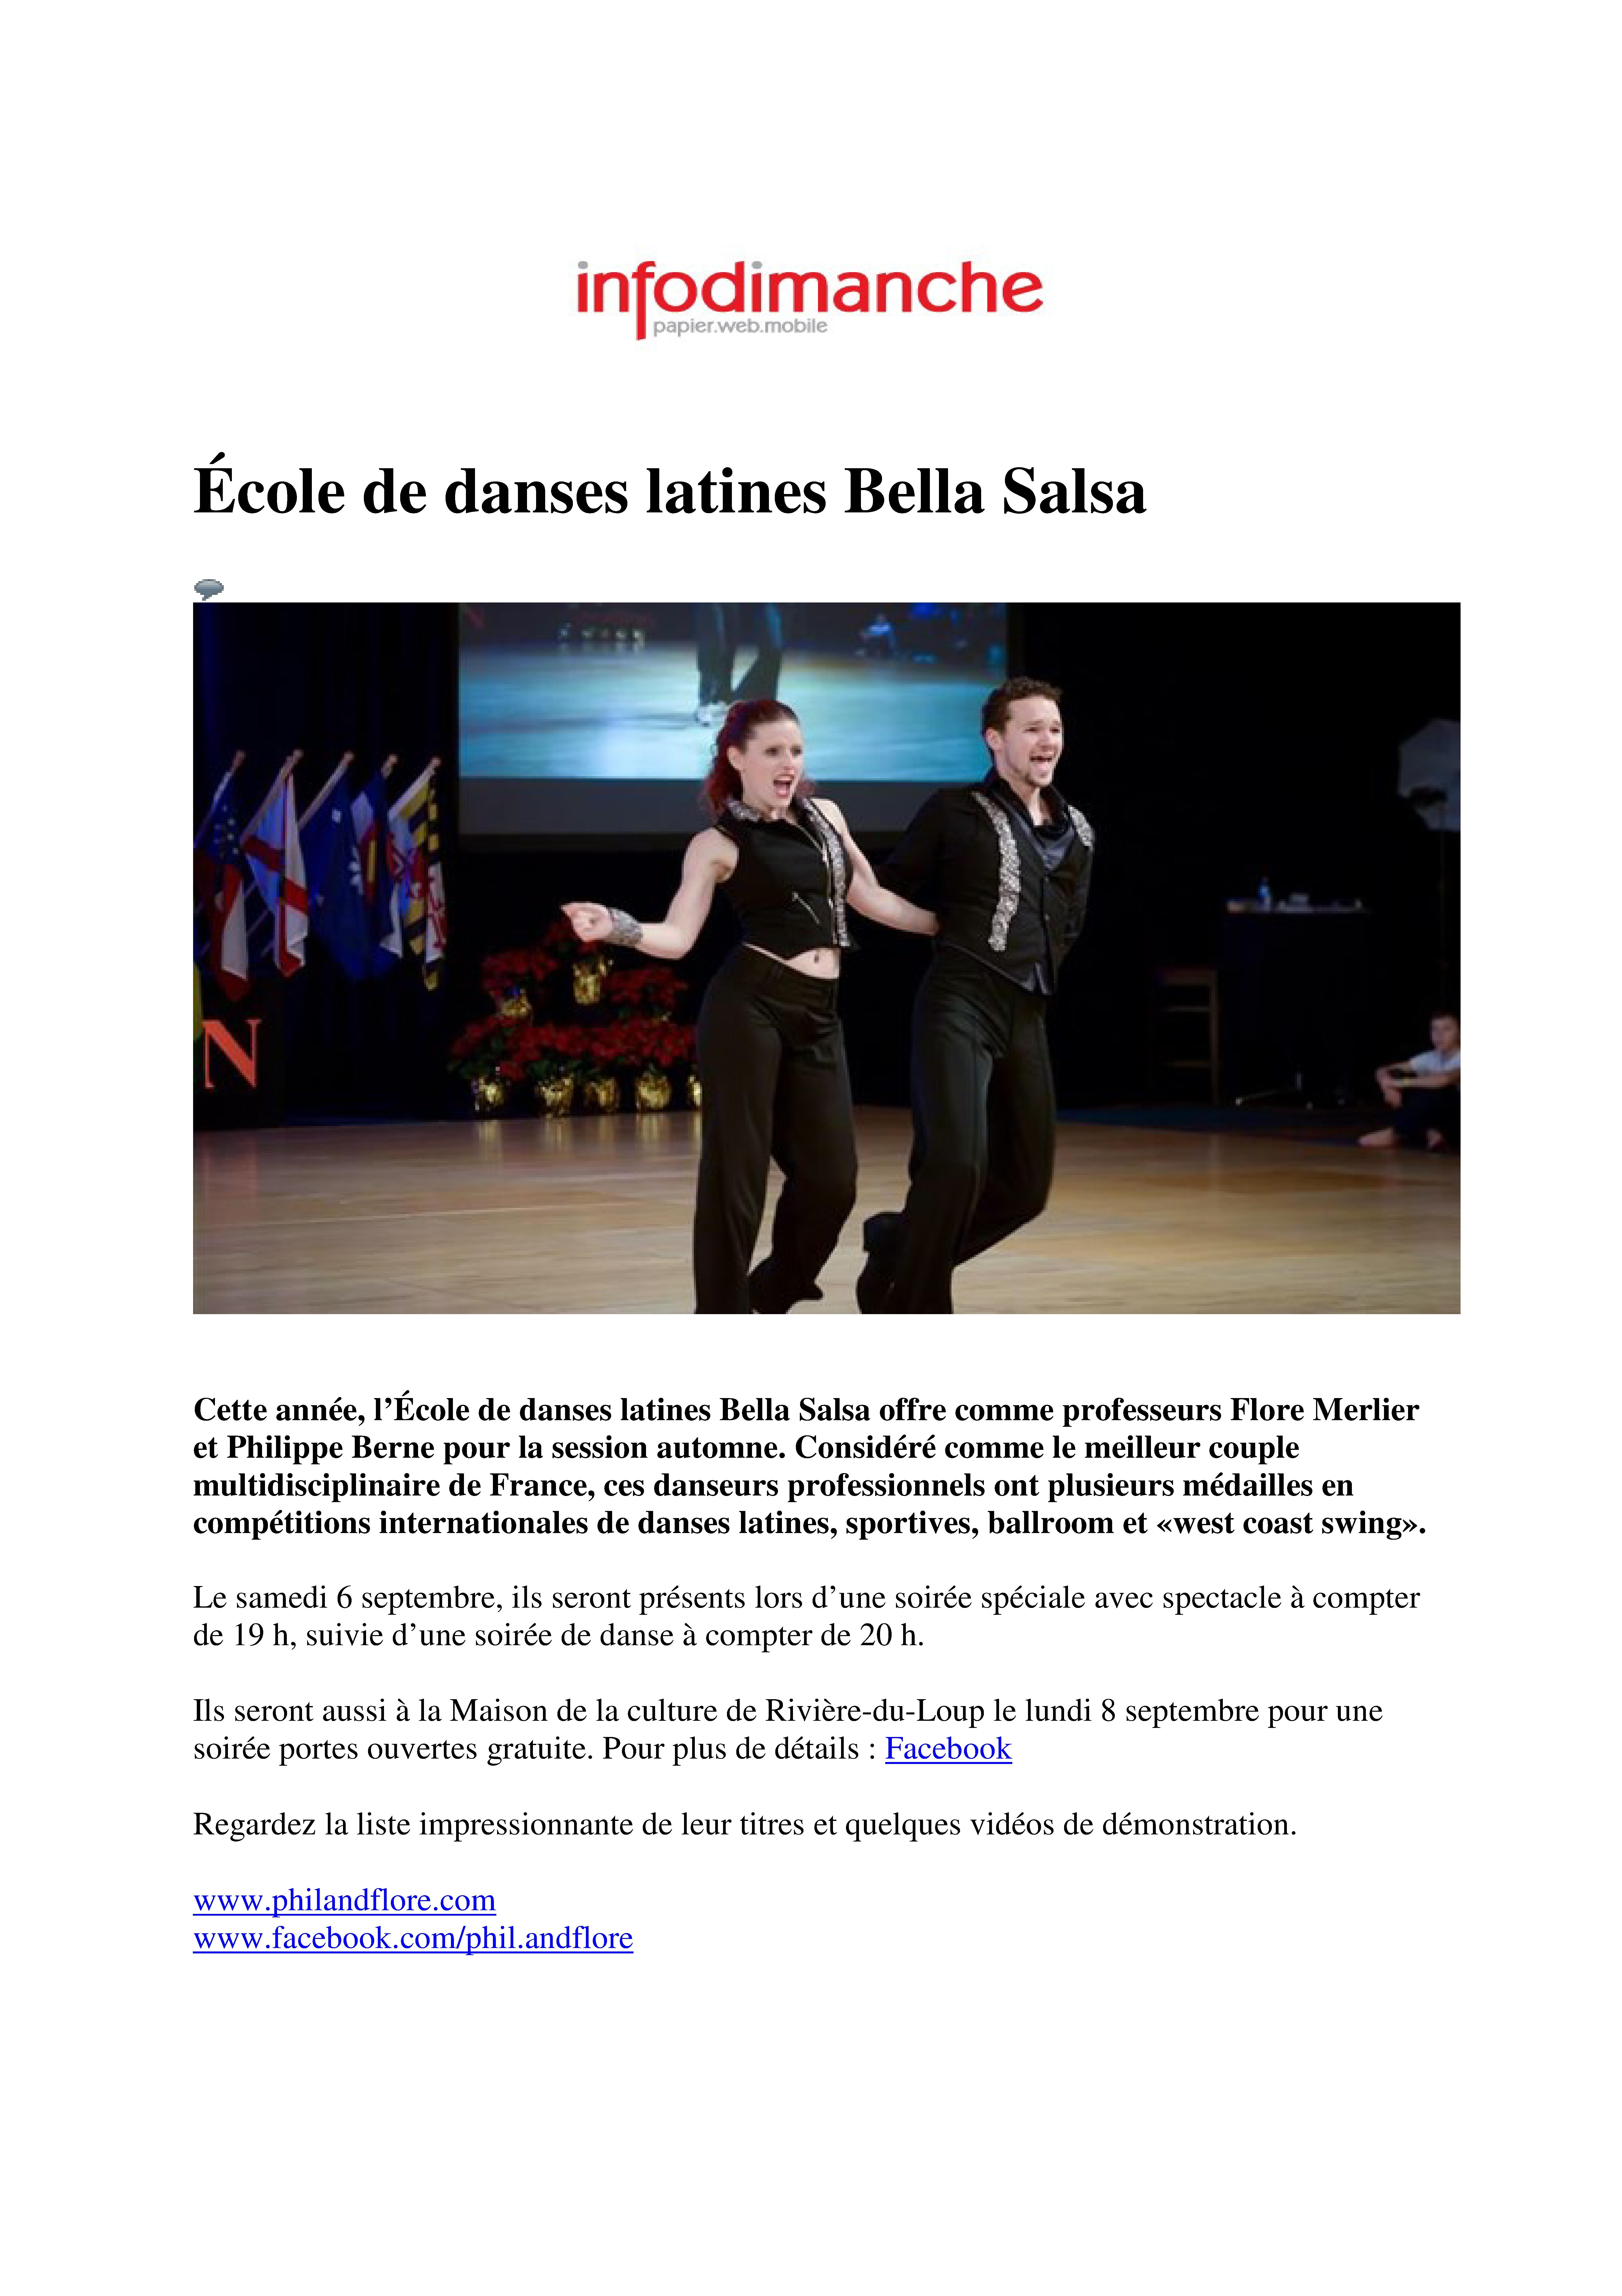 Info Dimanche Bella Salsa.jpg